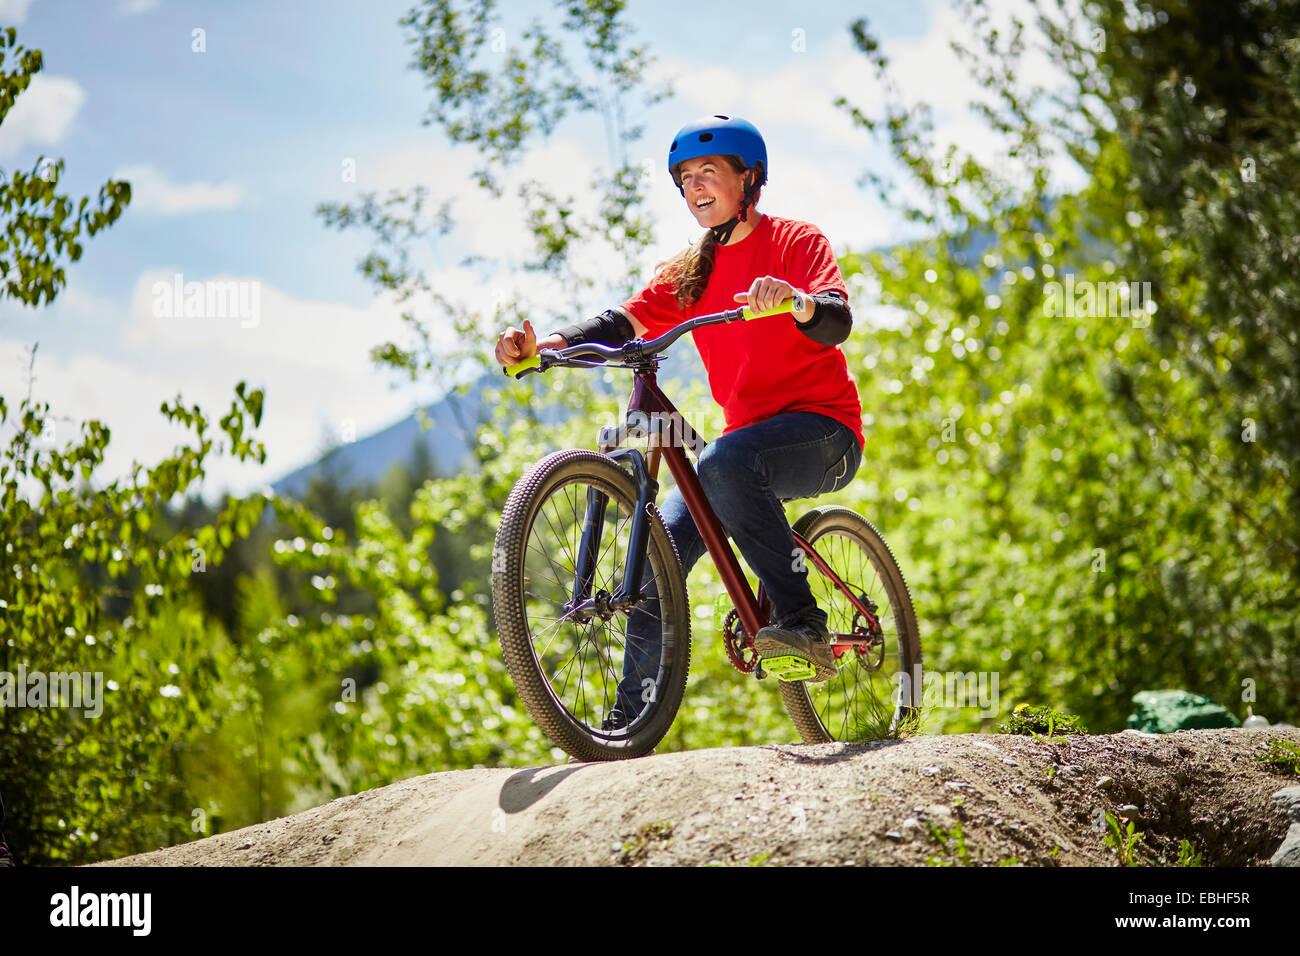 Junge weibliche bmx-Biker am Rand der Felsen im Wald Stockbild